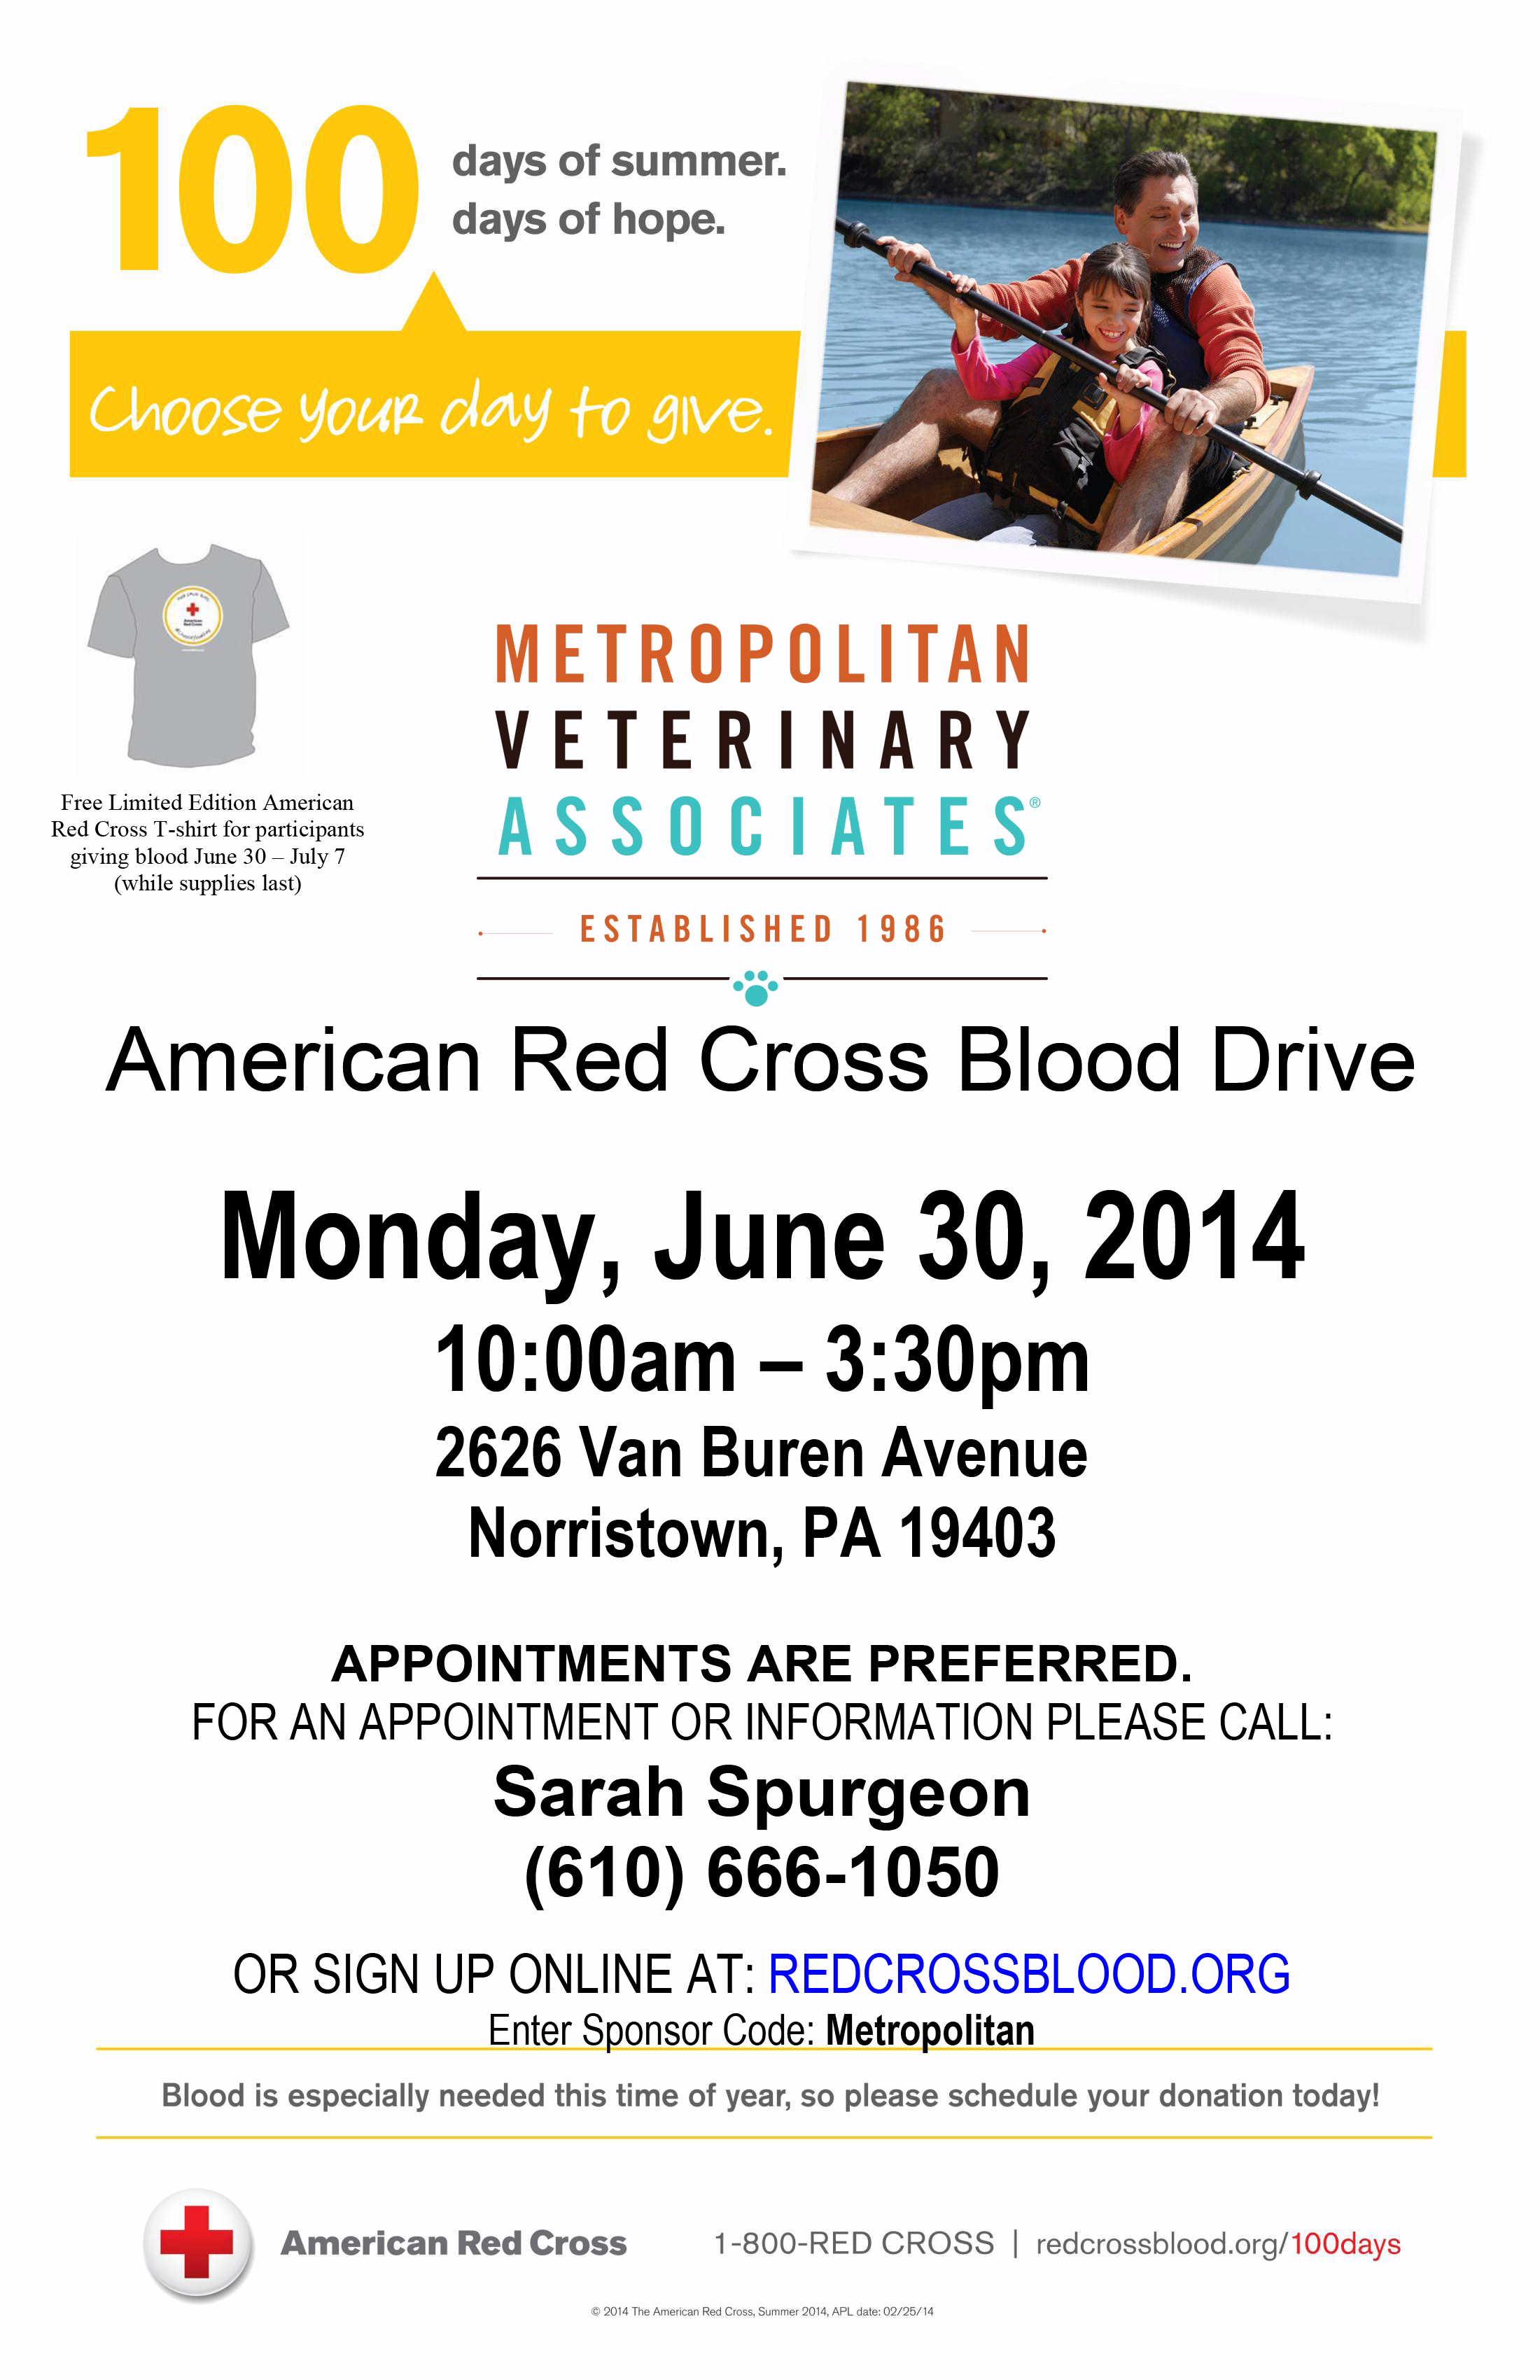 American Red Cross Blood Drive - Metropolitan Veterinary Associates